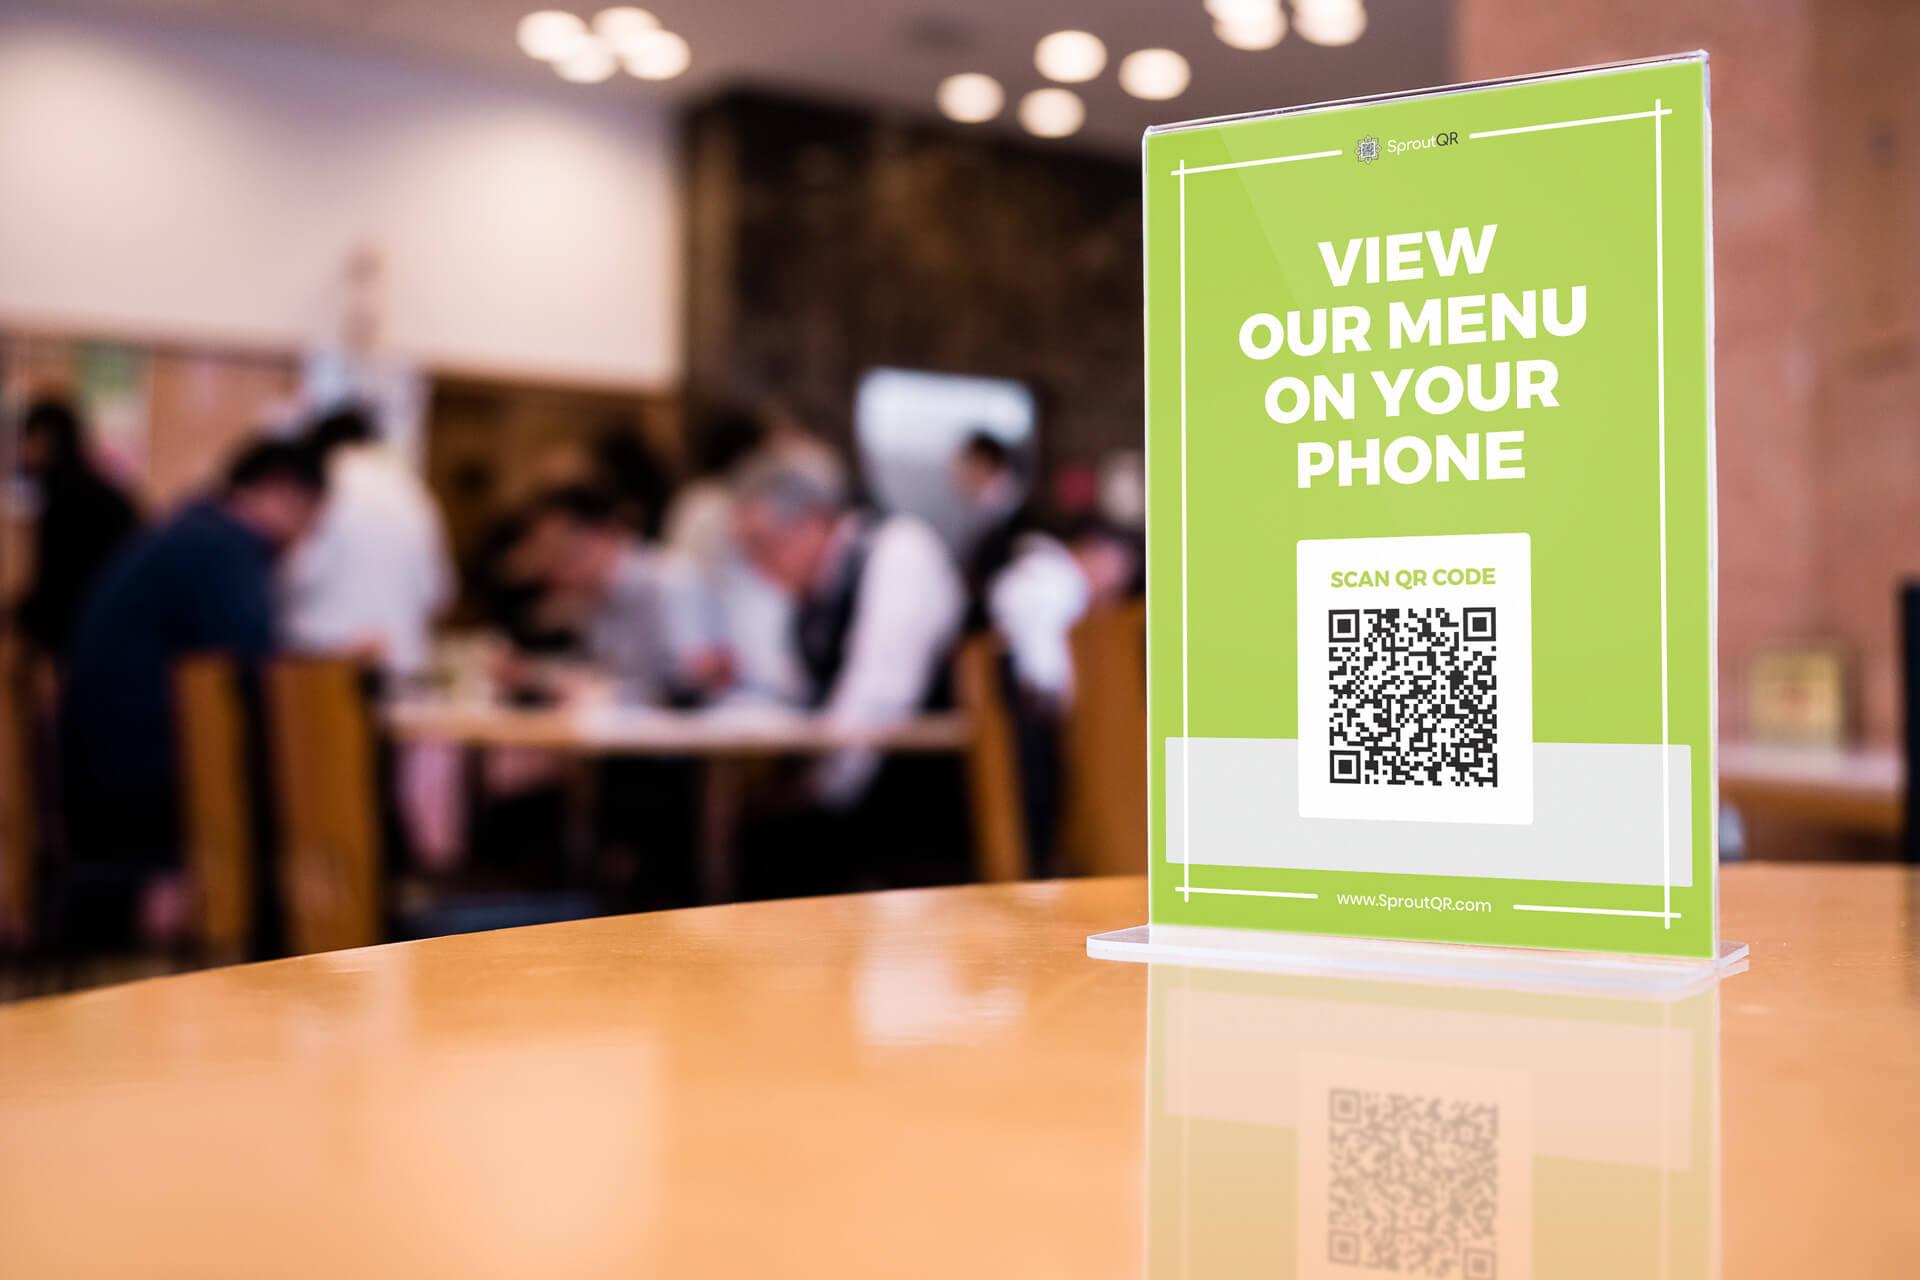 QR code on tabletop displayette